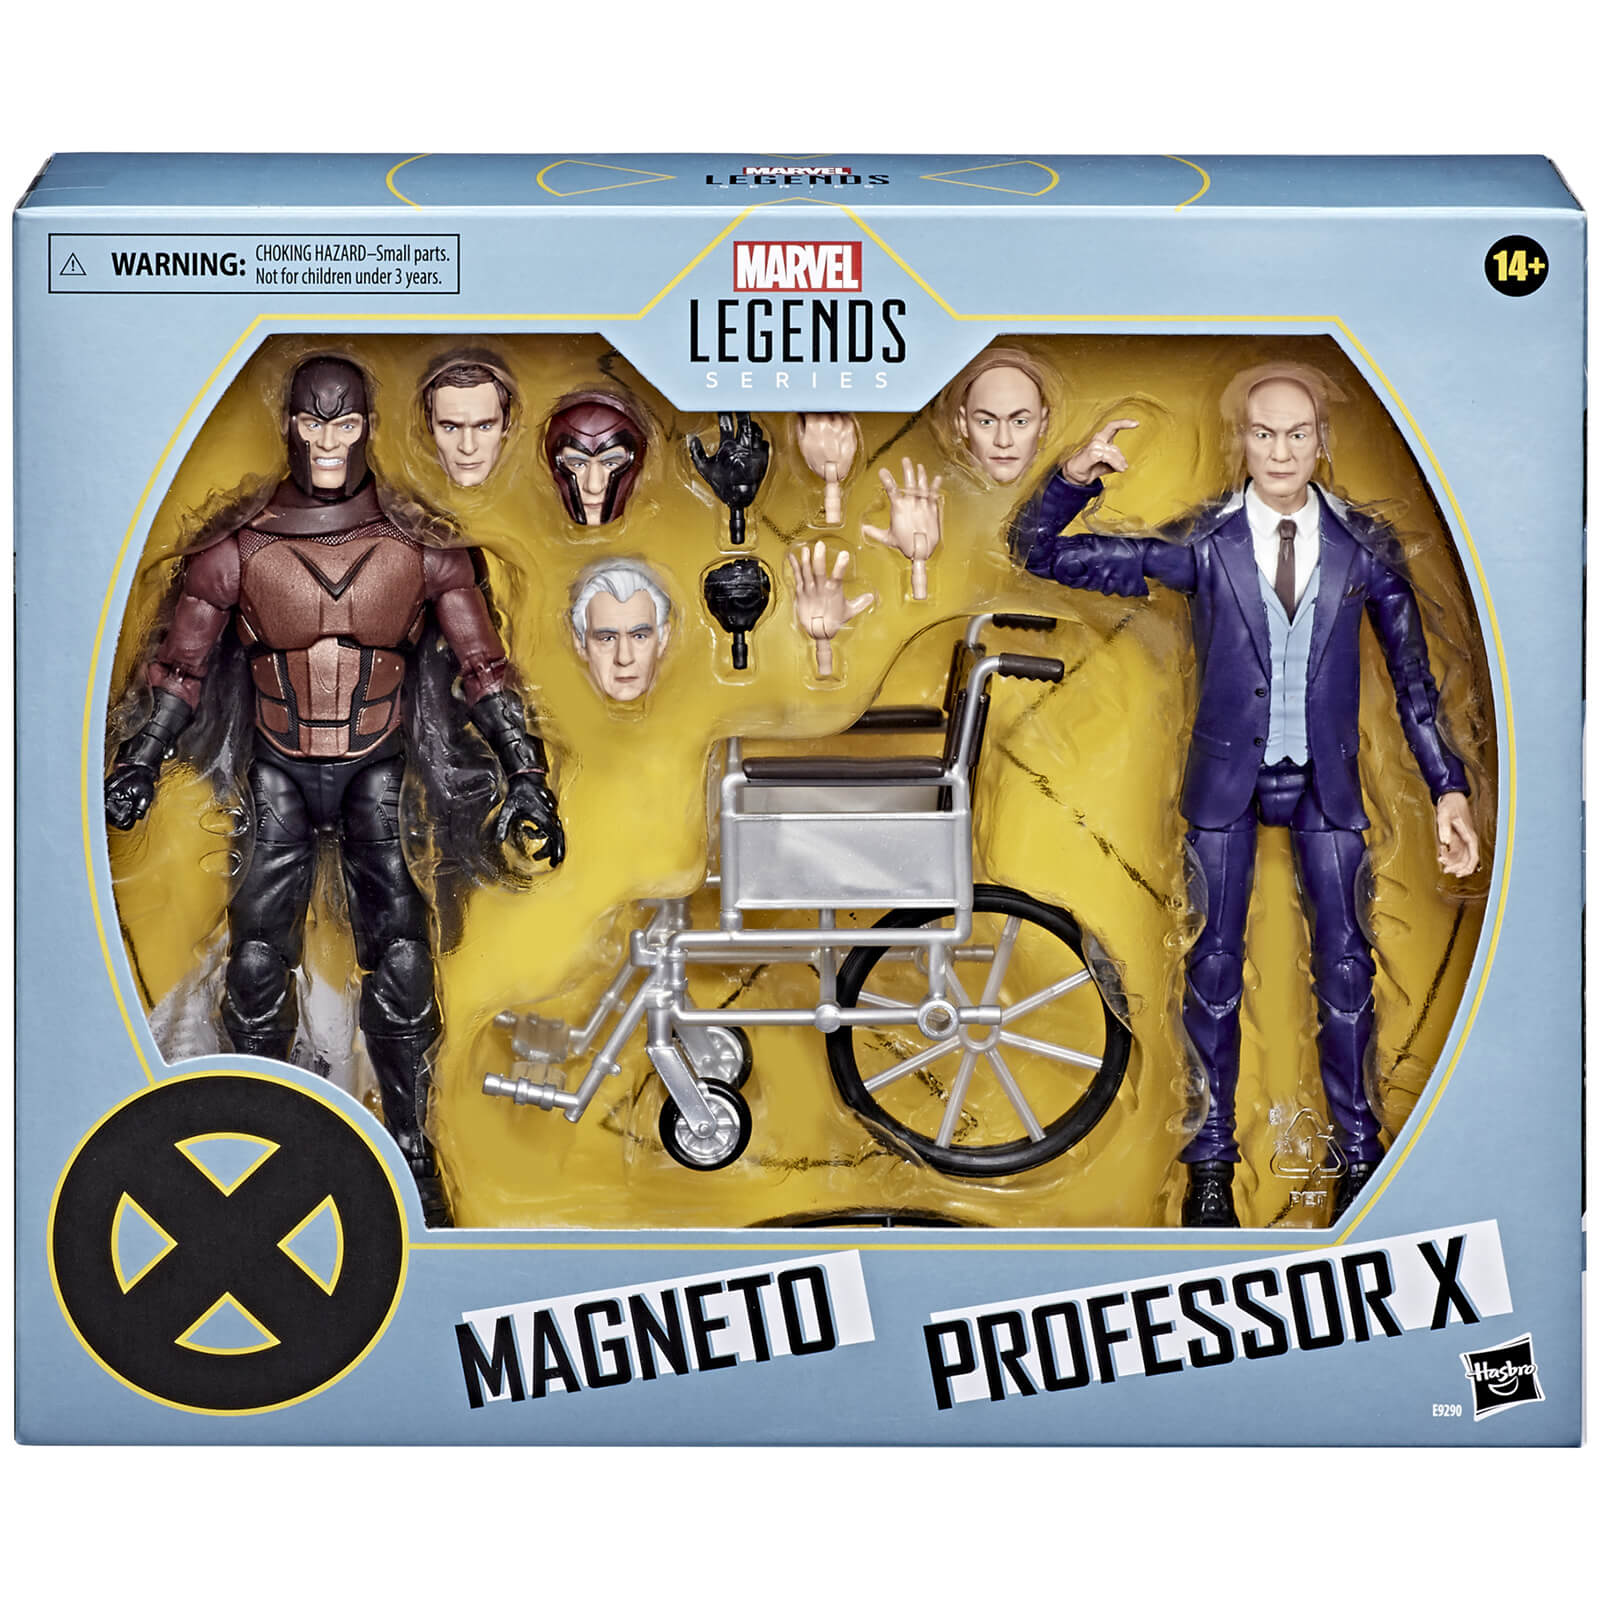 Image of Hasbro Marvel Legends X-Men Magneto and Professor X Action Figure Set